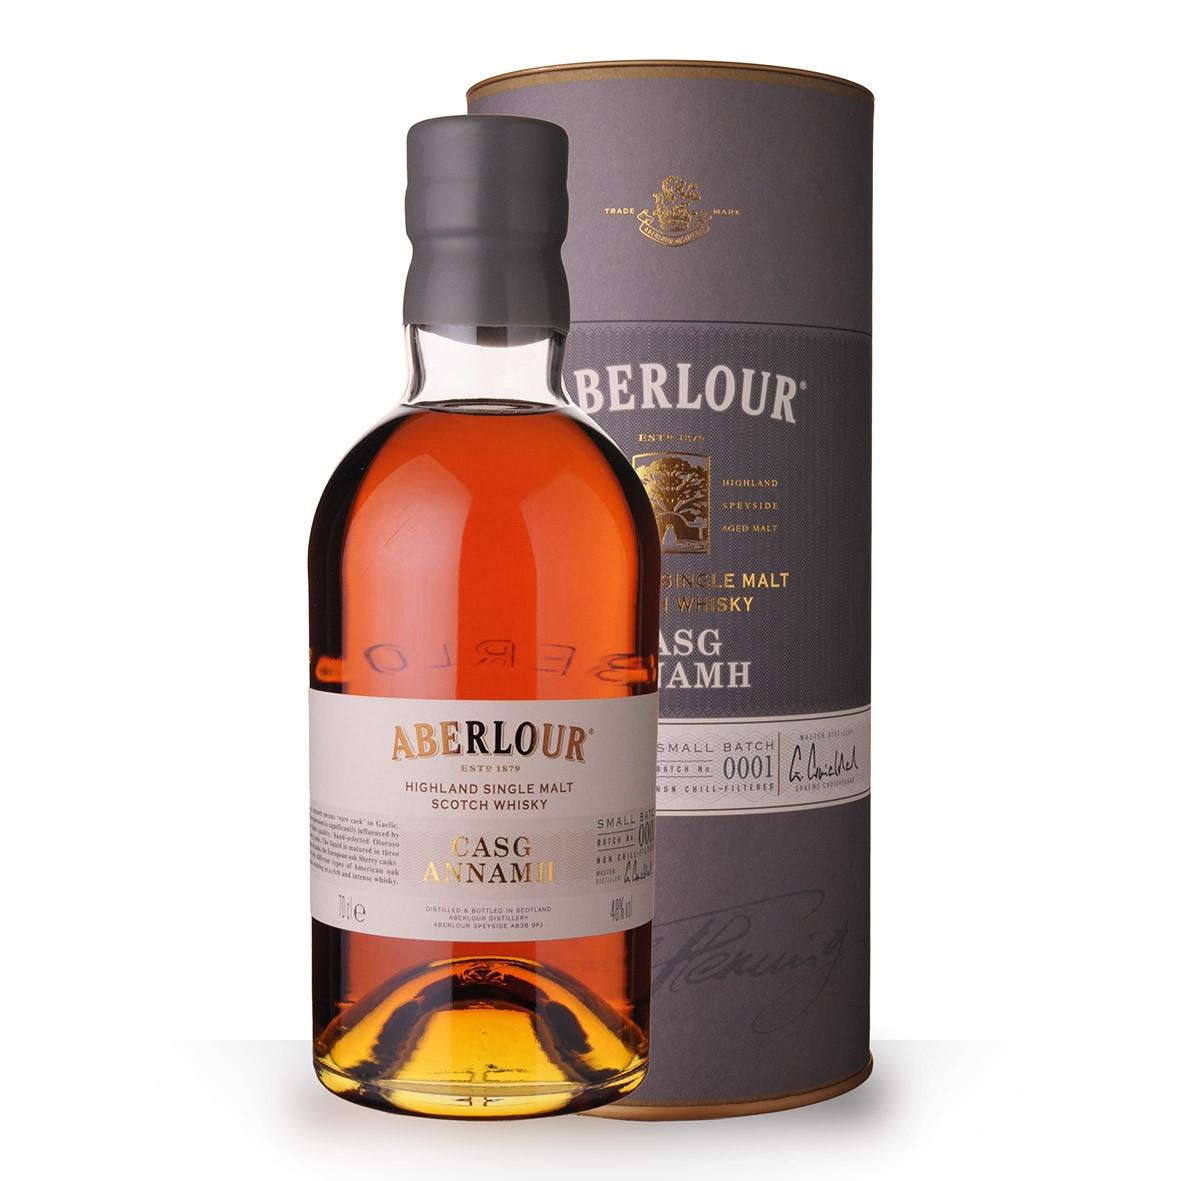 Whisky Aberlour Casg Annamh 70cl Coffret www.odyssee-vins.com